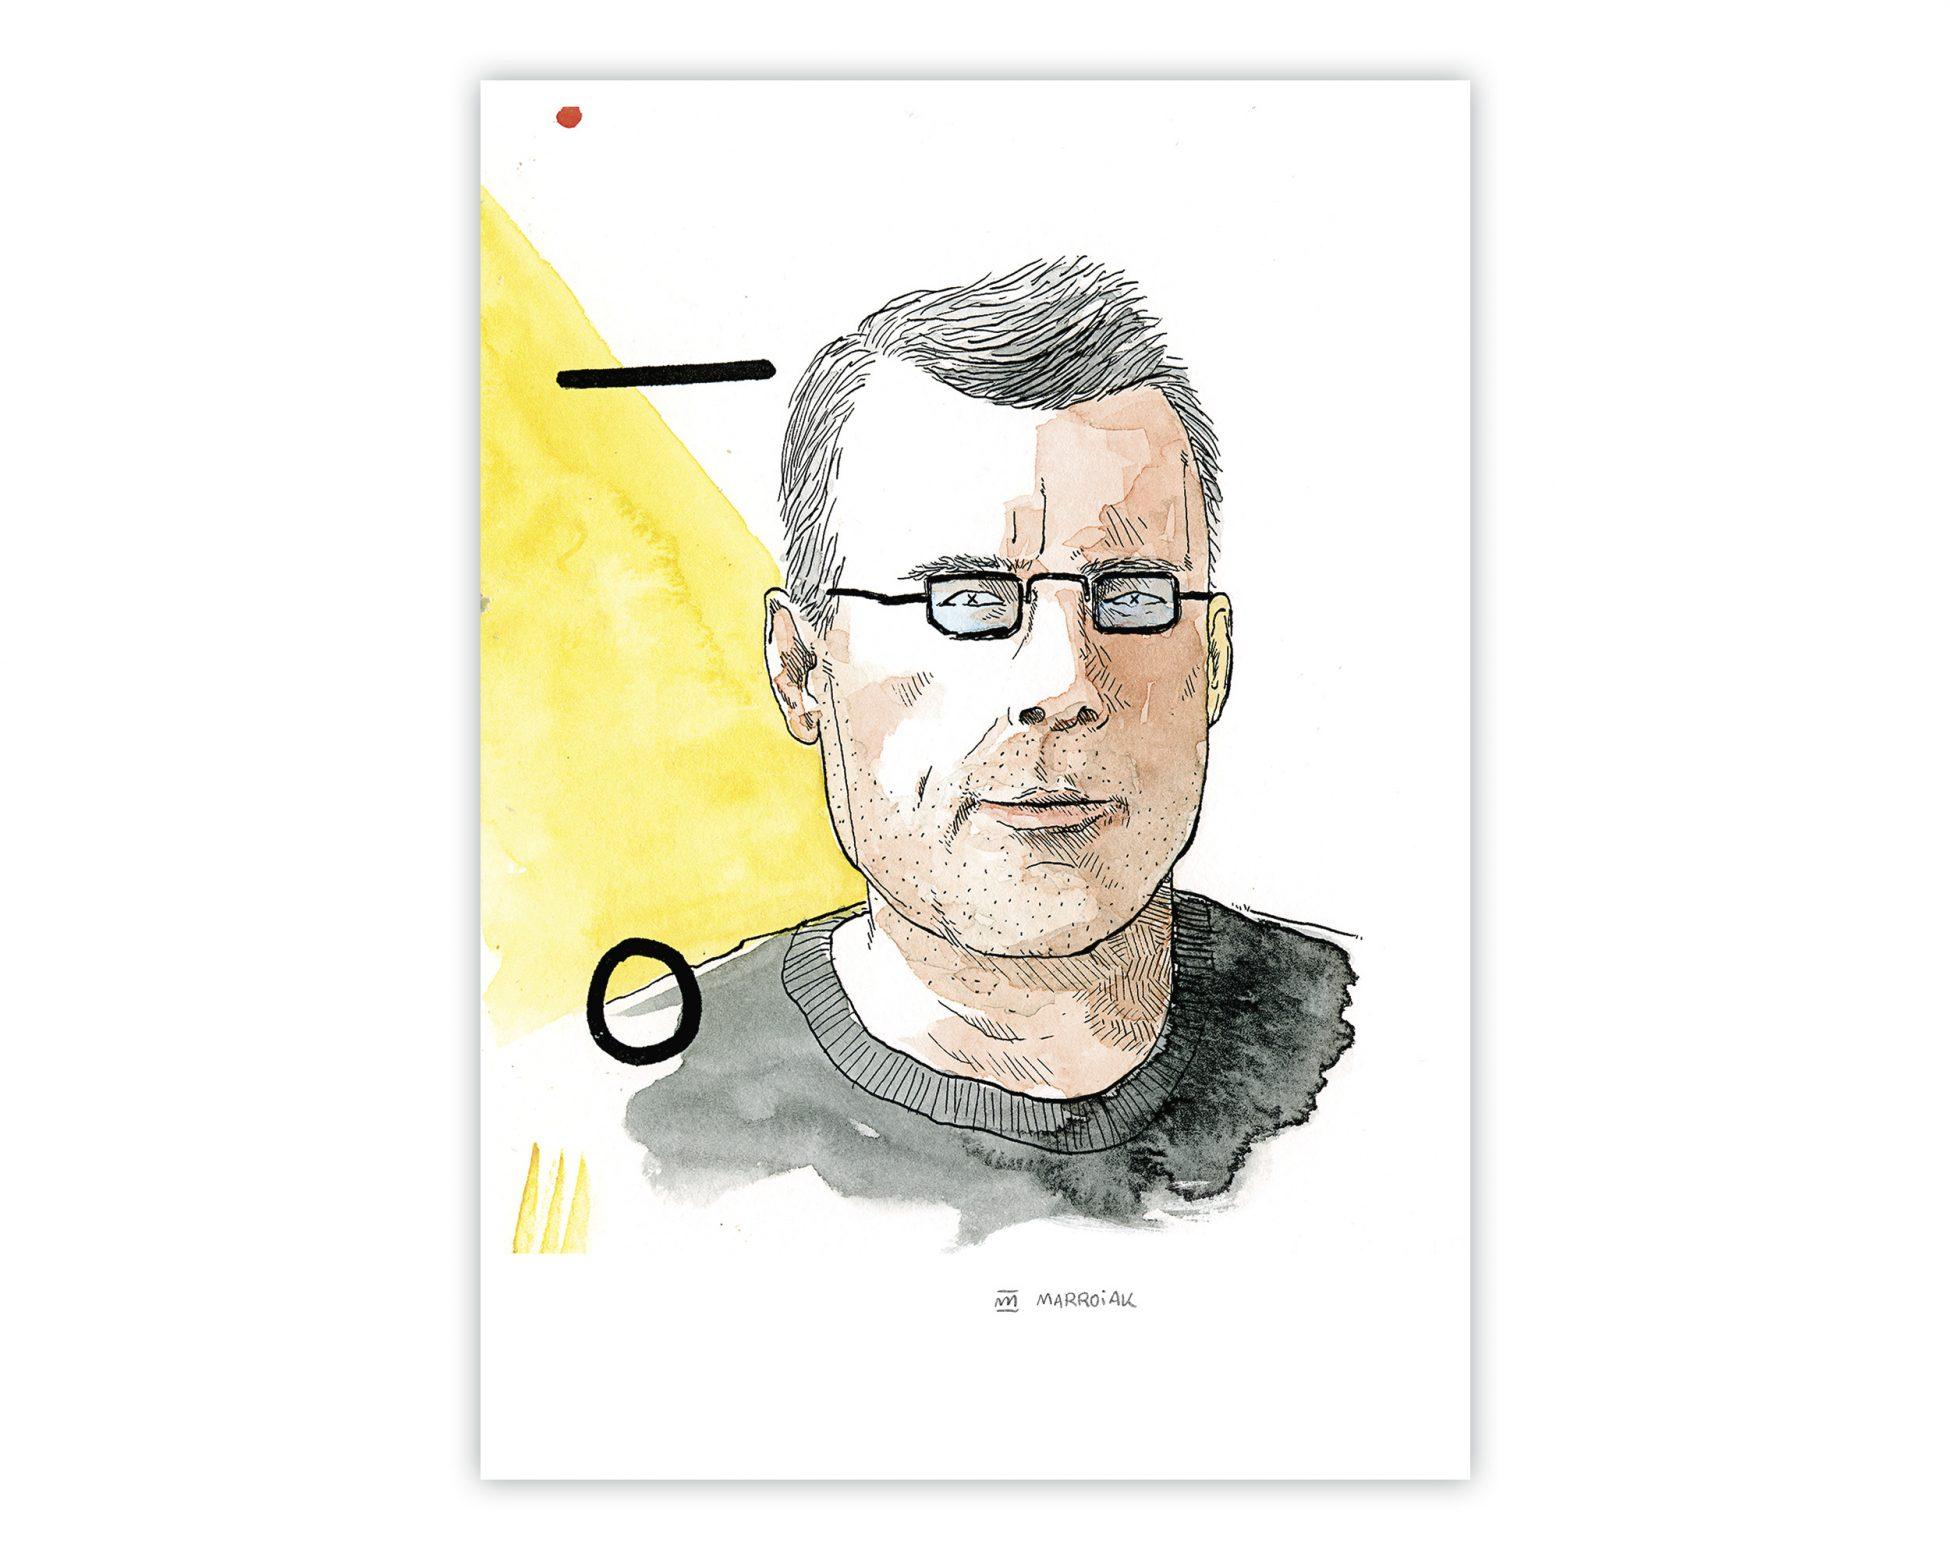 Dibujo retrato stephen king. Ilustración en acuarela